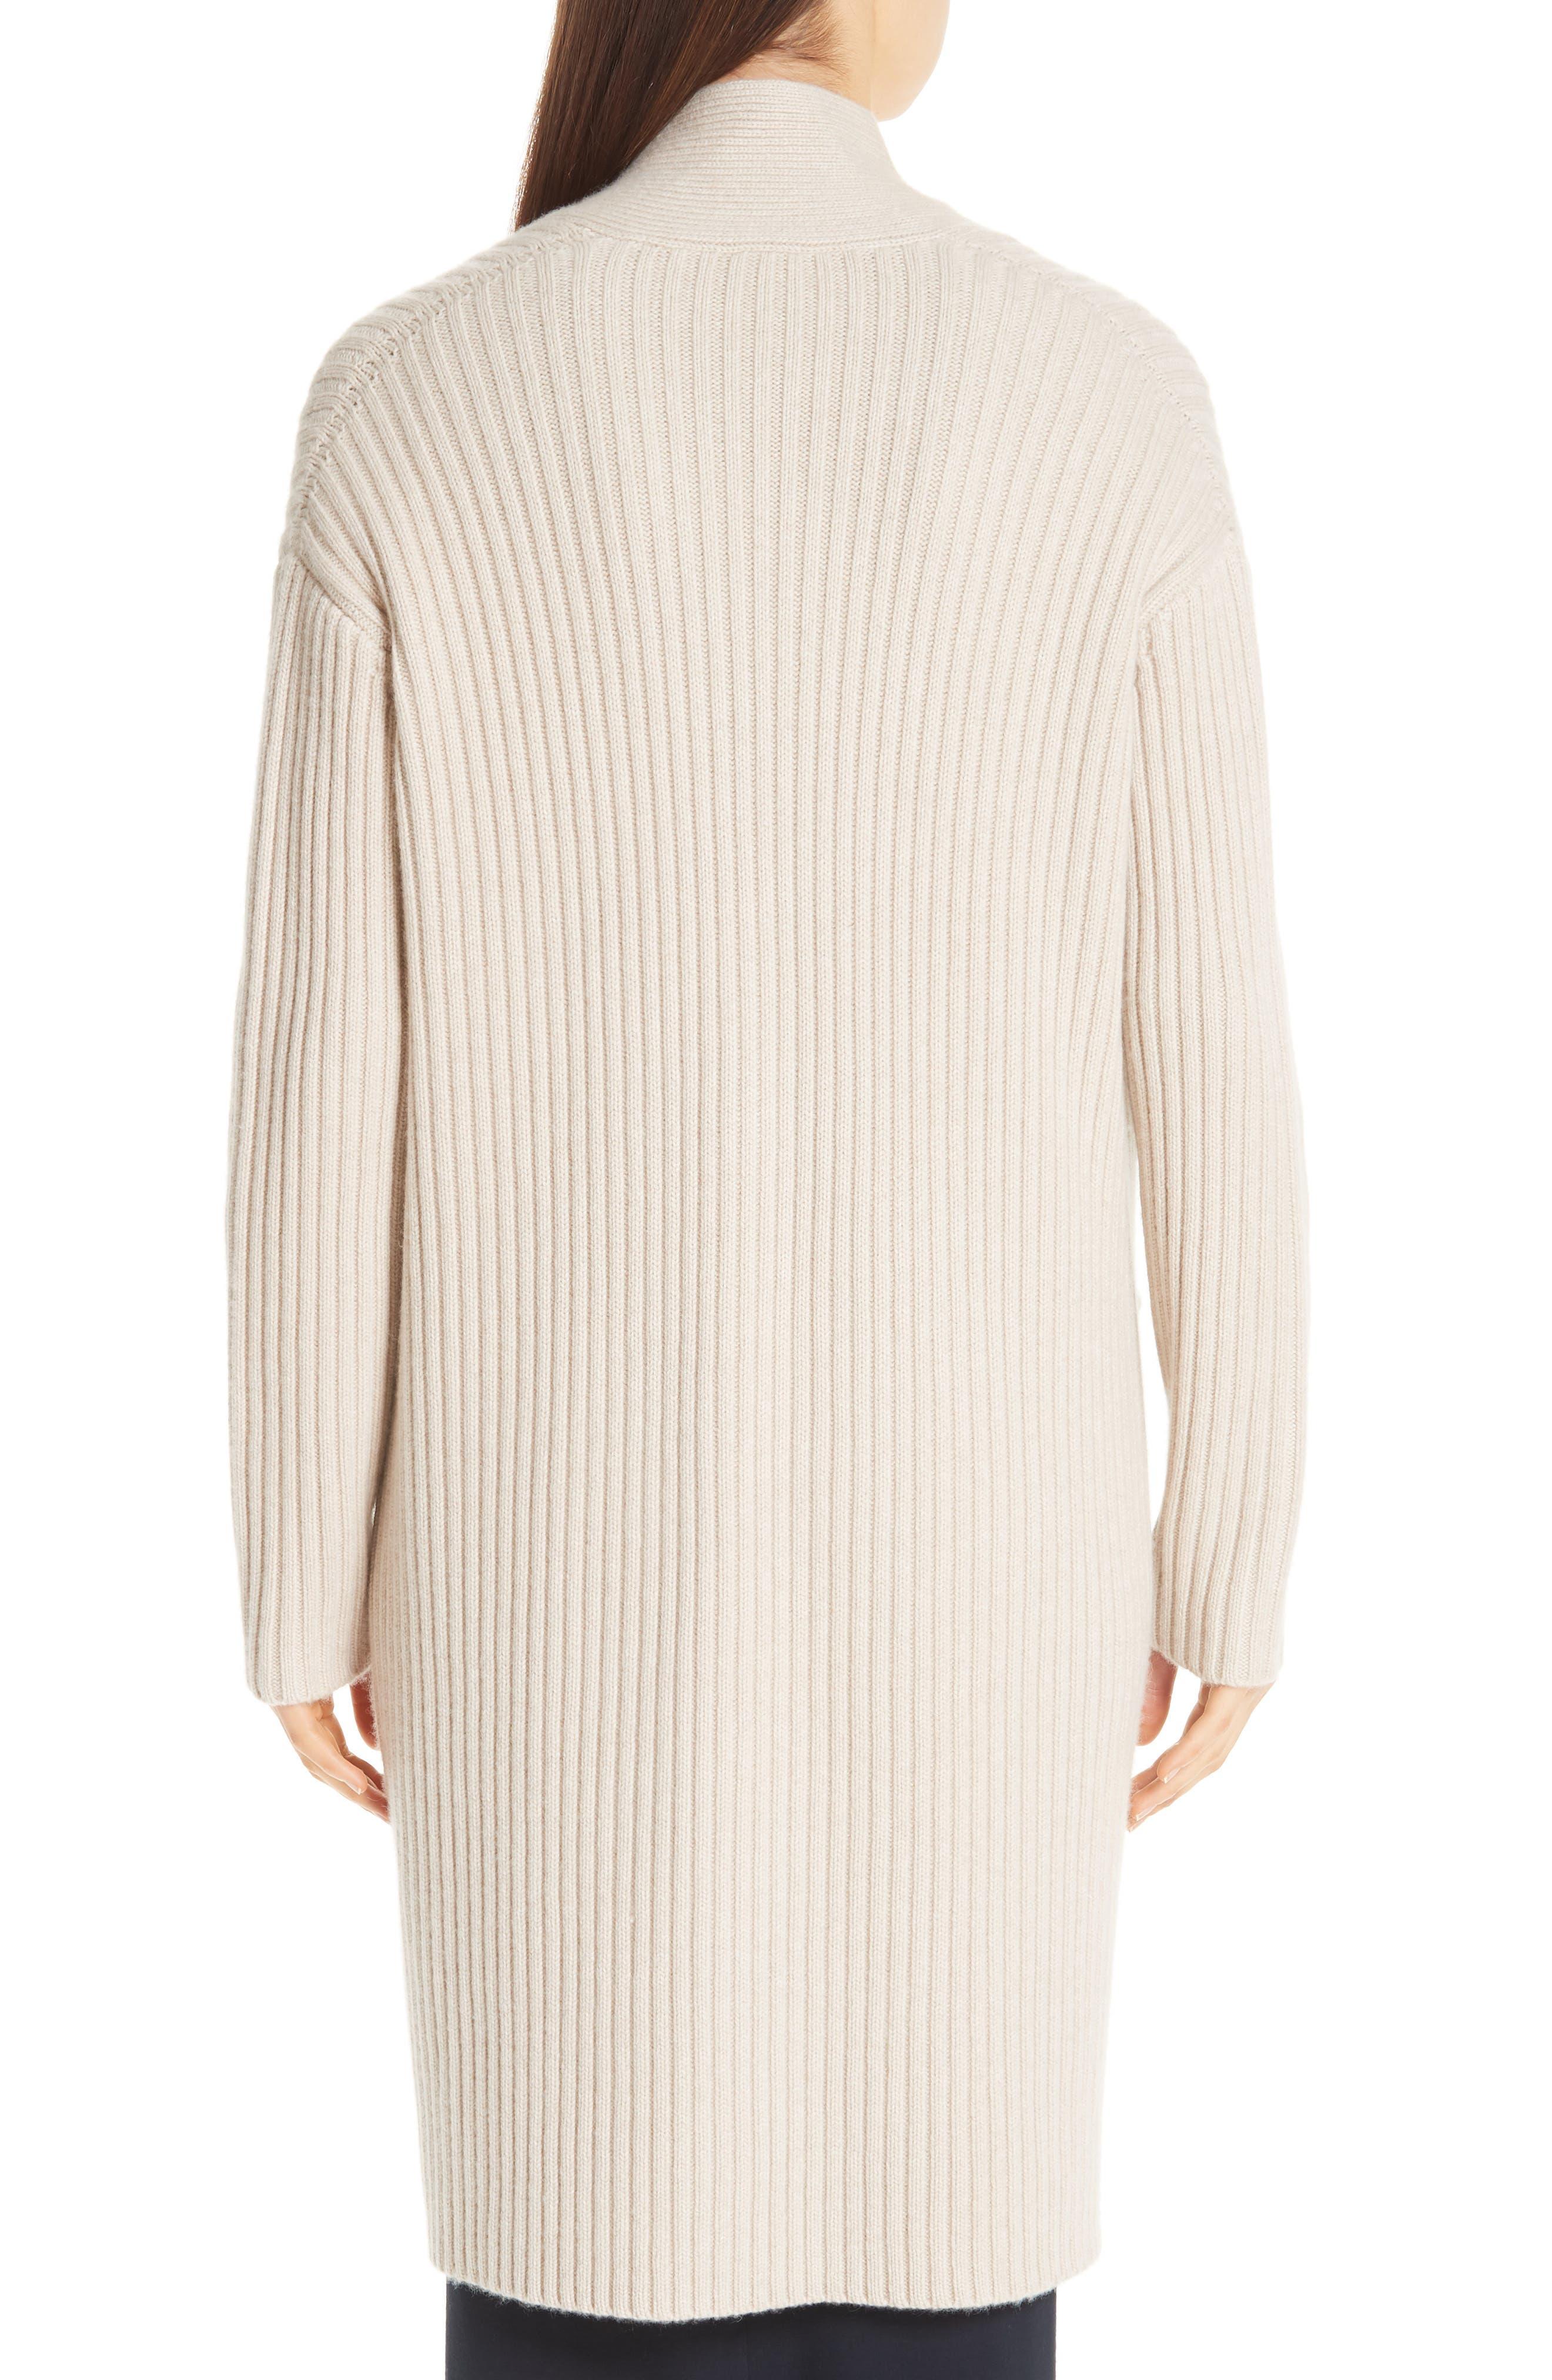 Lia Cashmere & Merino Wool Sweater,                             Alternate thumbnail 2, color,                             SAND